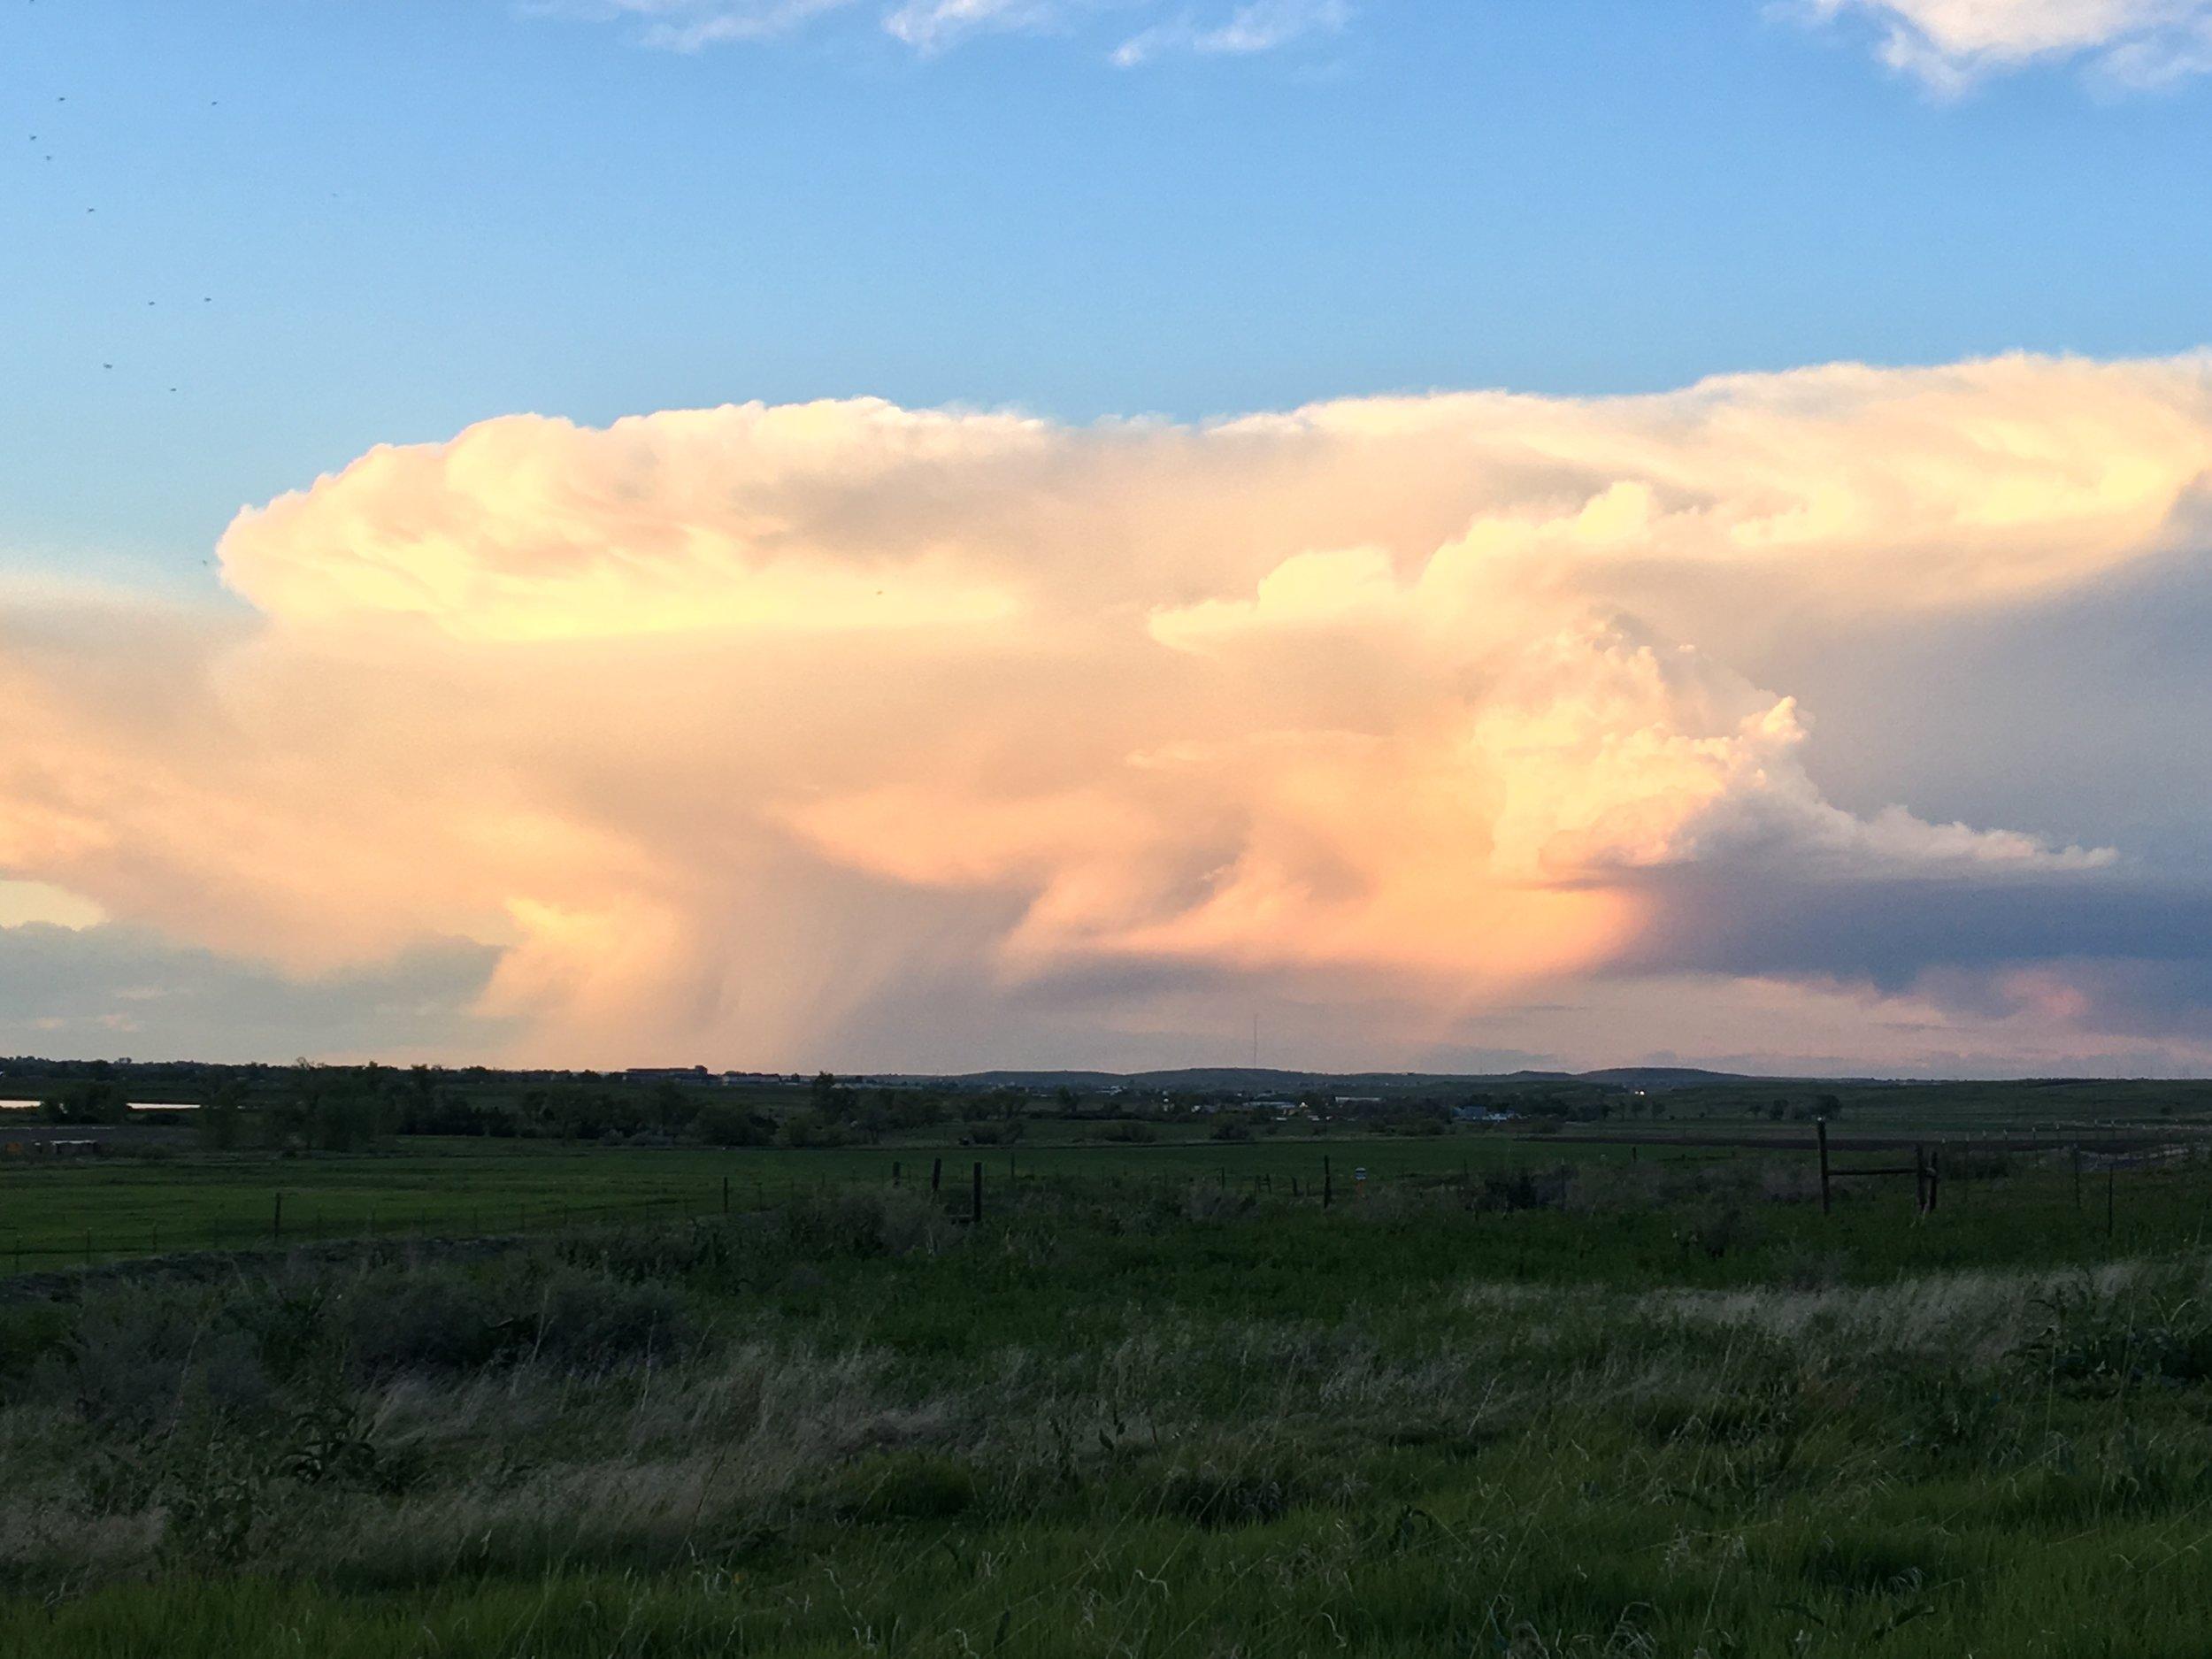 Photo taken in Northern Colorado